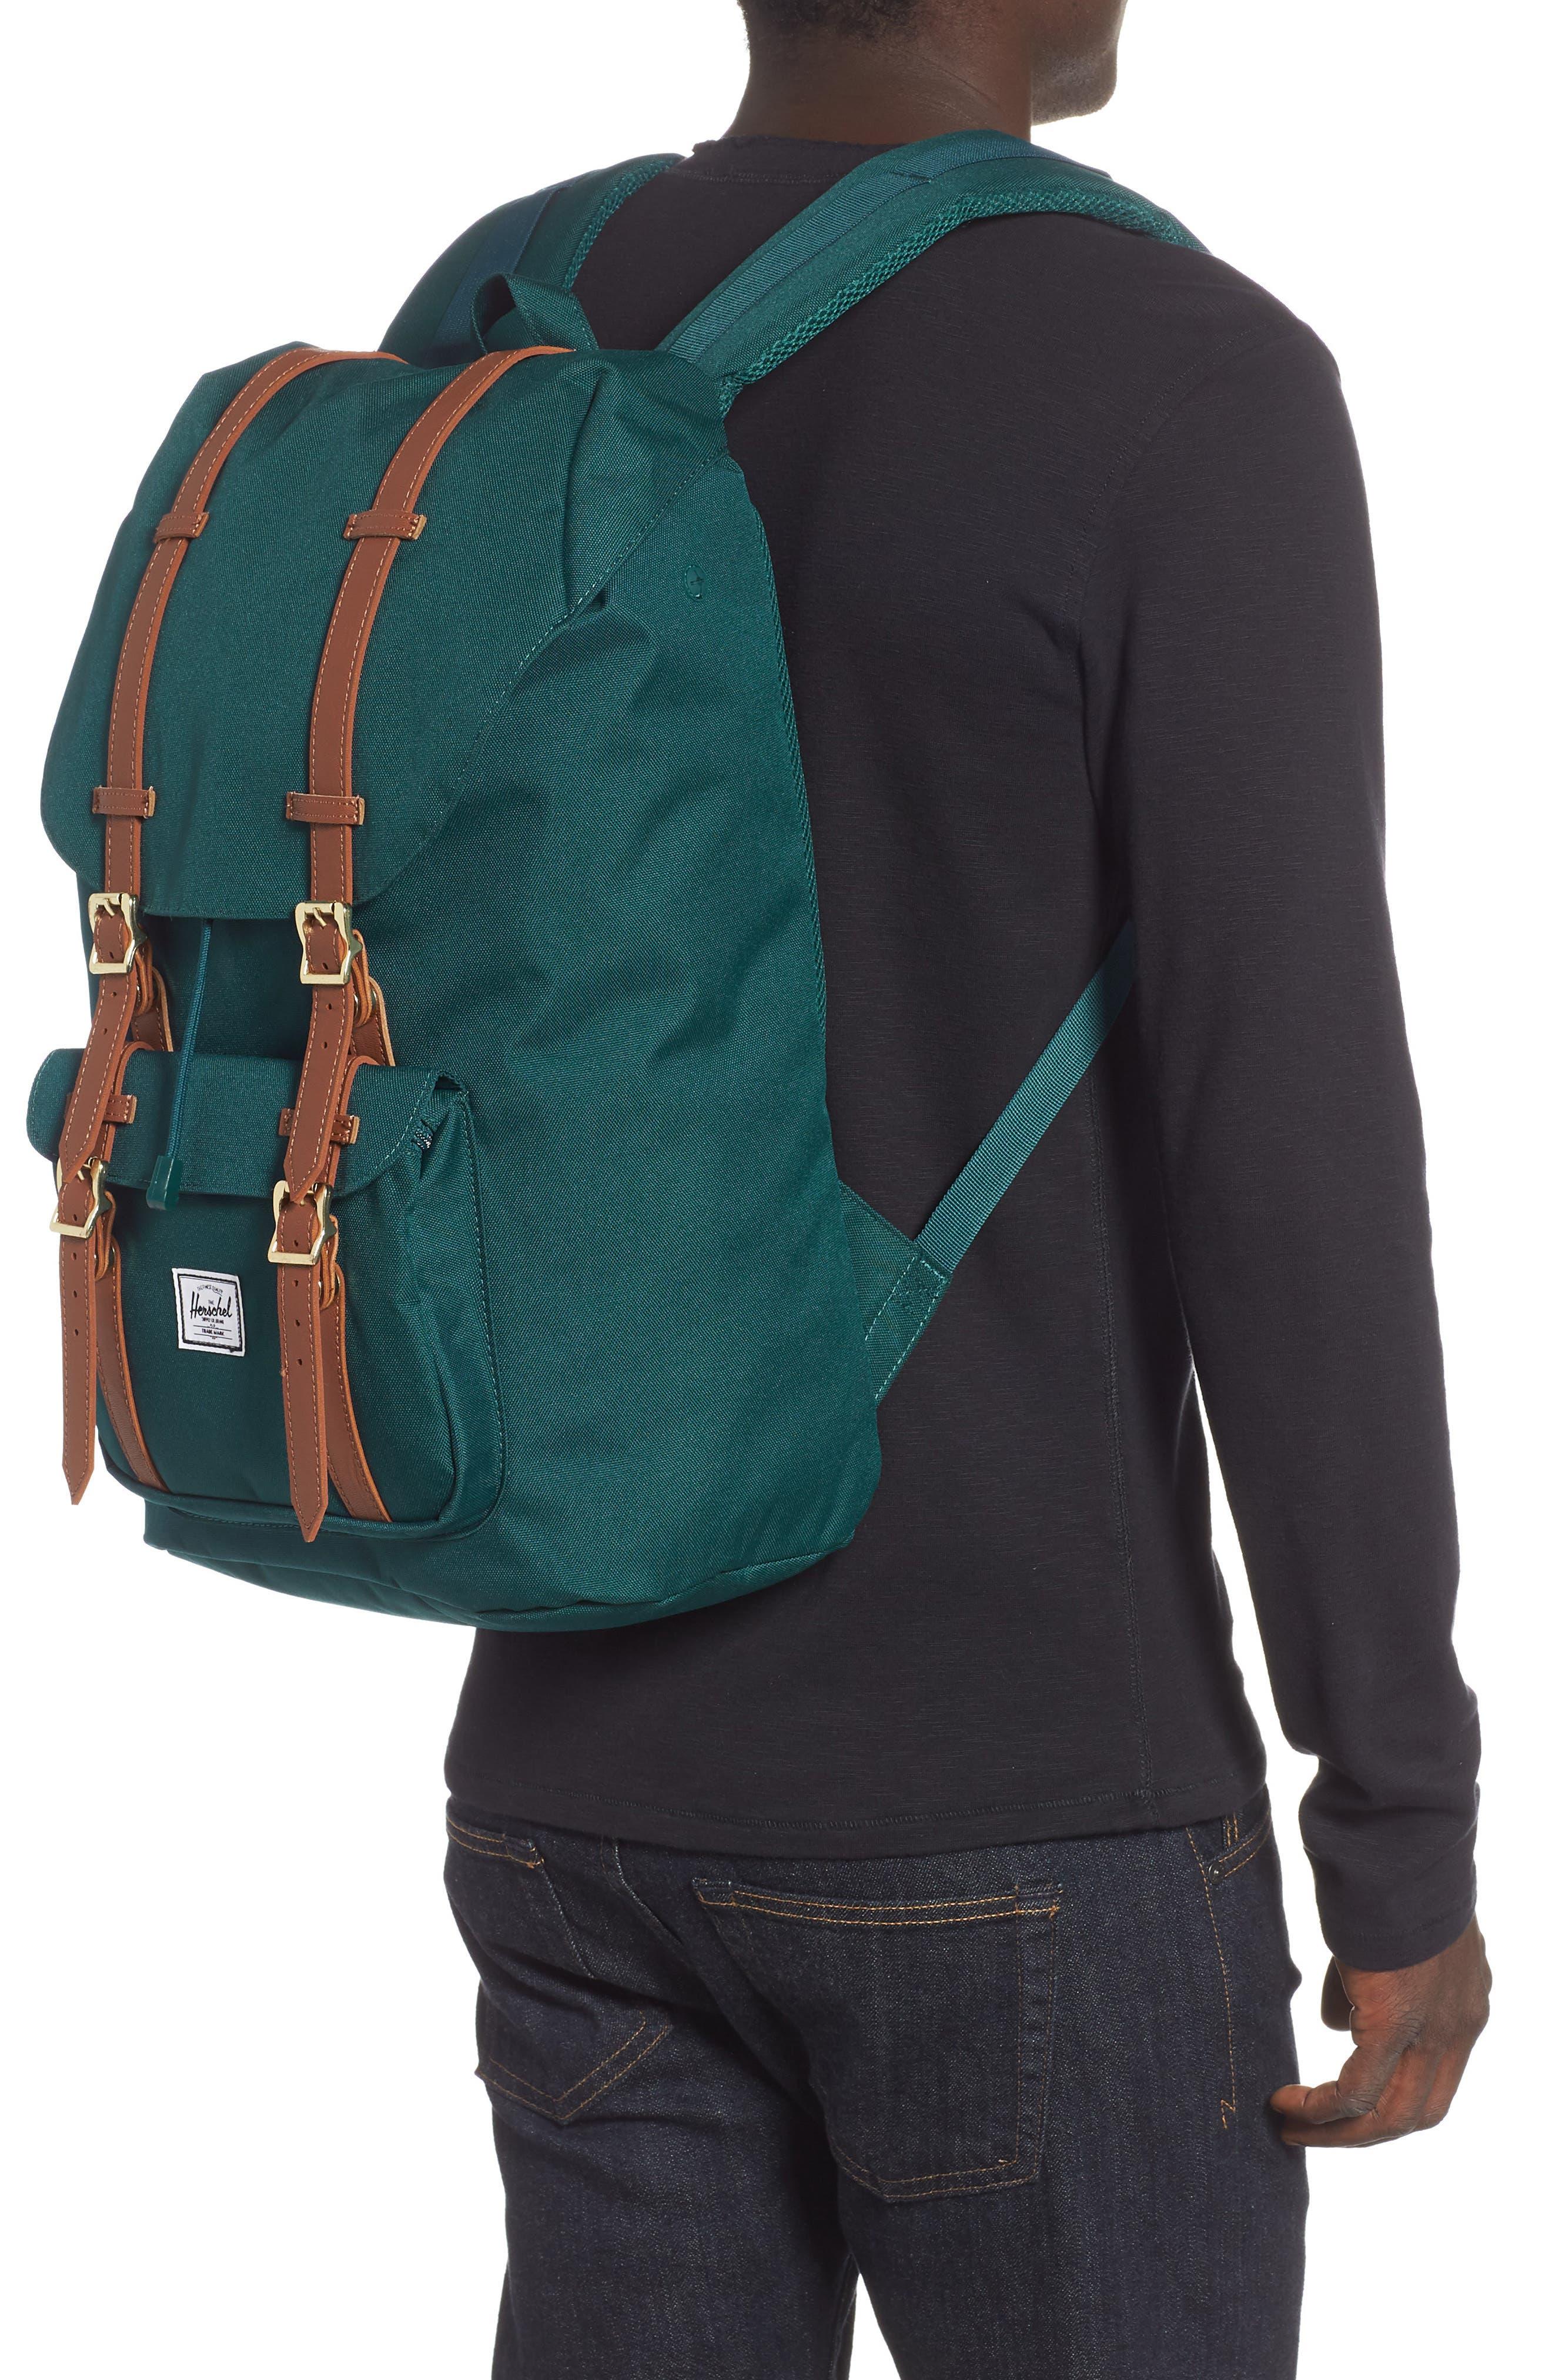 Little America Backpack,                             Alternate thumbnail 2, color,                             DEEP TEAL/ TAN